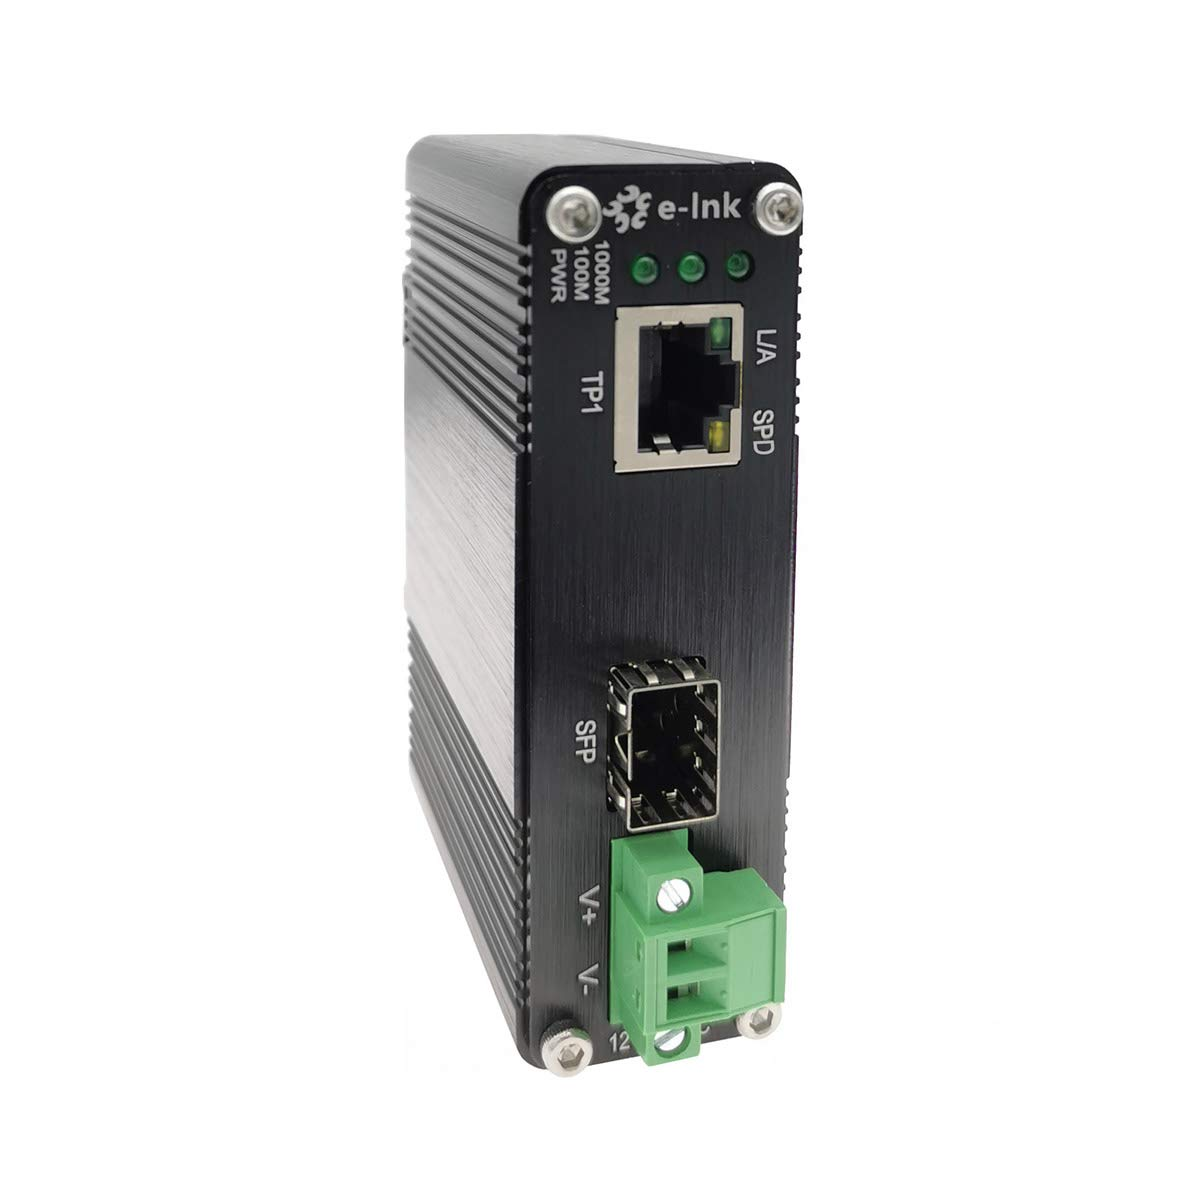 Mini Industrial Gigabit Media Converter Outdoor Use Din Rail Mount Hardened 10/100/1000Mbps RJ45 Ethernet to Fiber Optic Converter with 100Base-FX or 1000Base-FX Auto Sensing SFP Port 12~48V DC Input